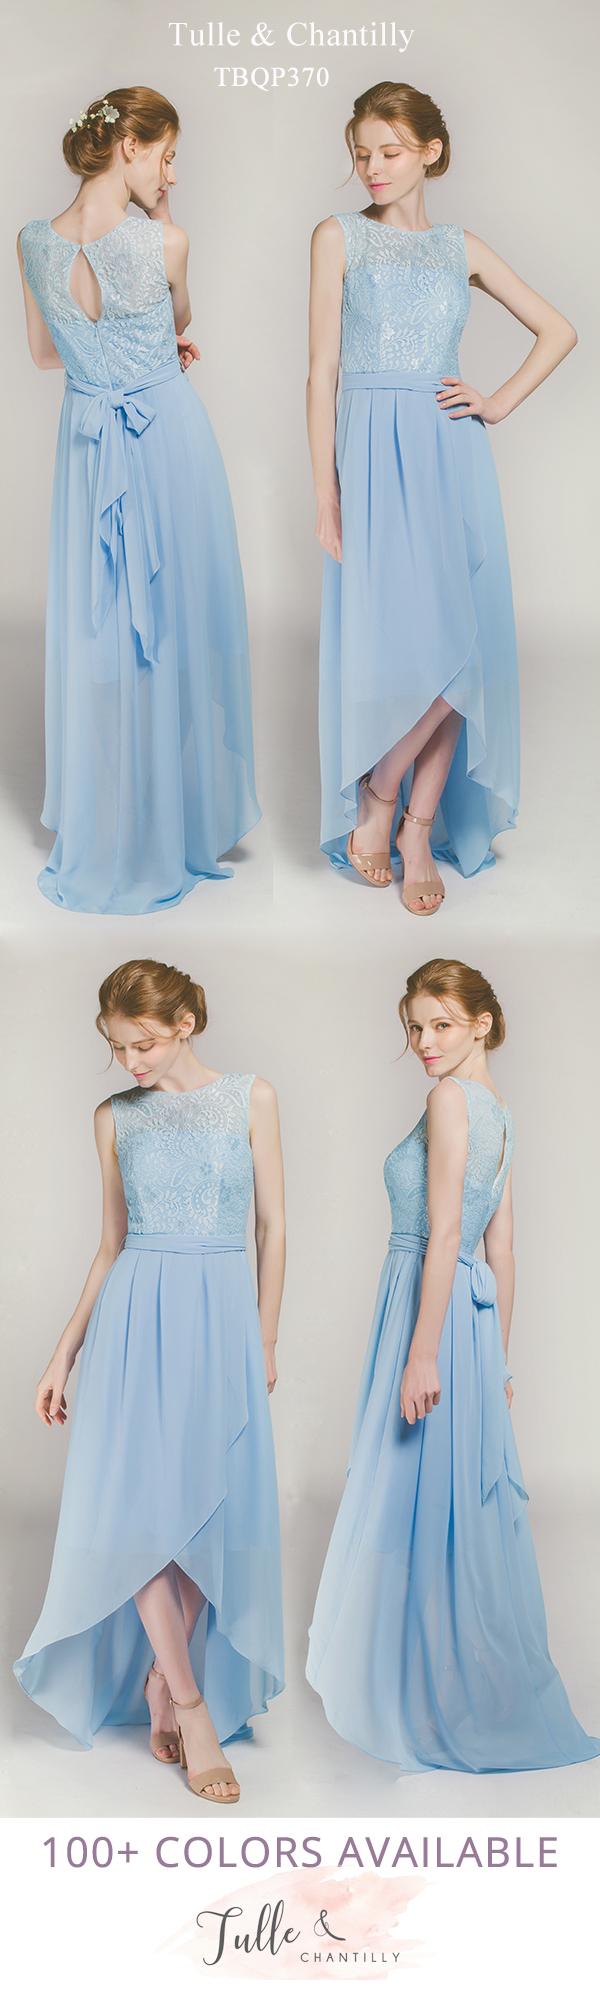 c868bd0c2 Sleeveless High Low Lace and Chiffon Bridesmaid Dress TBQP370 ...